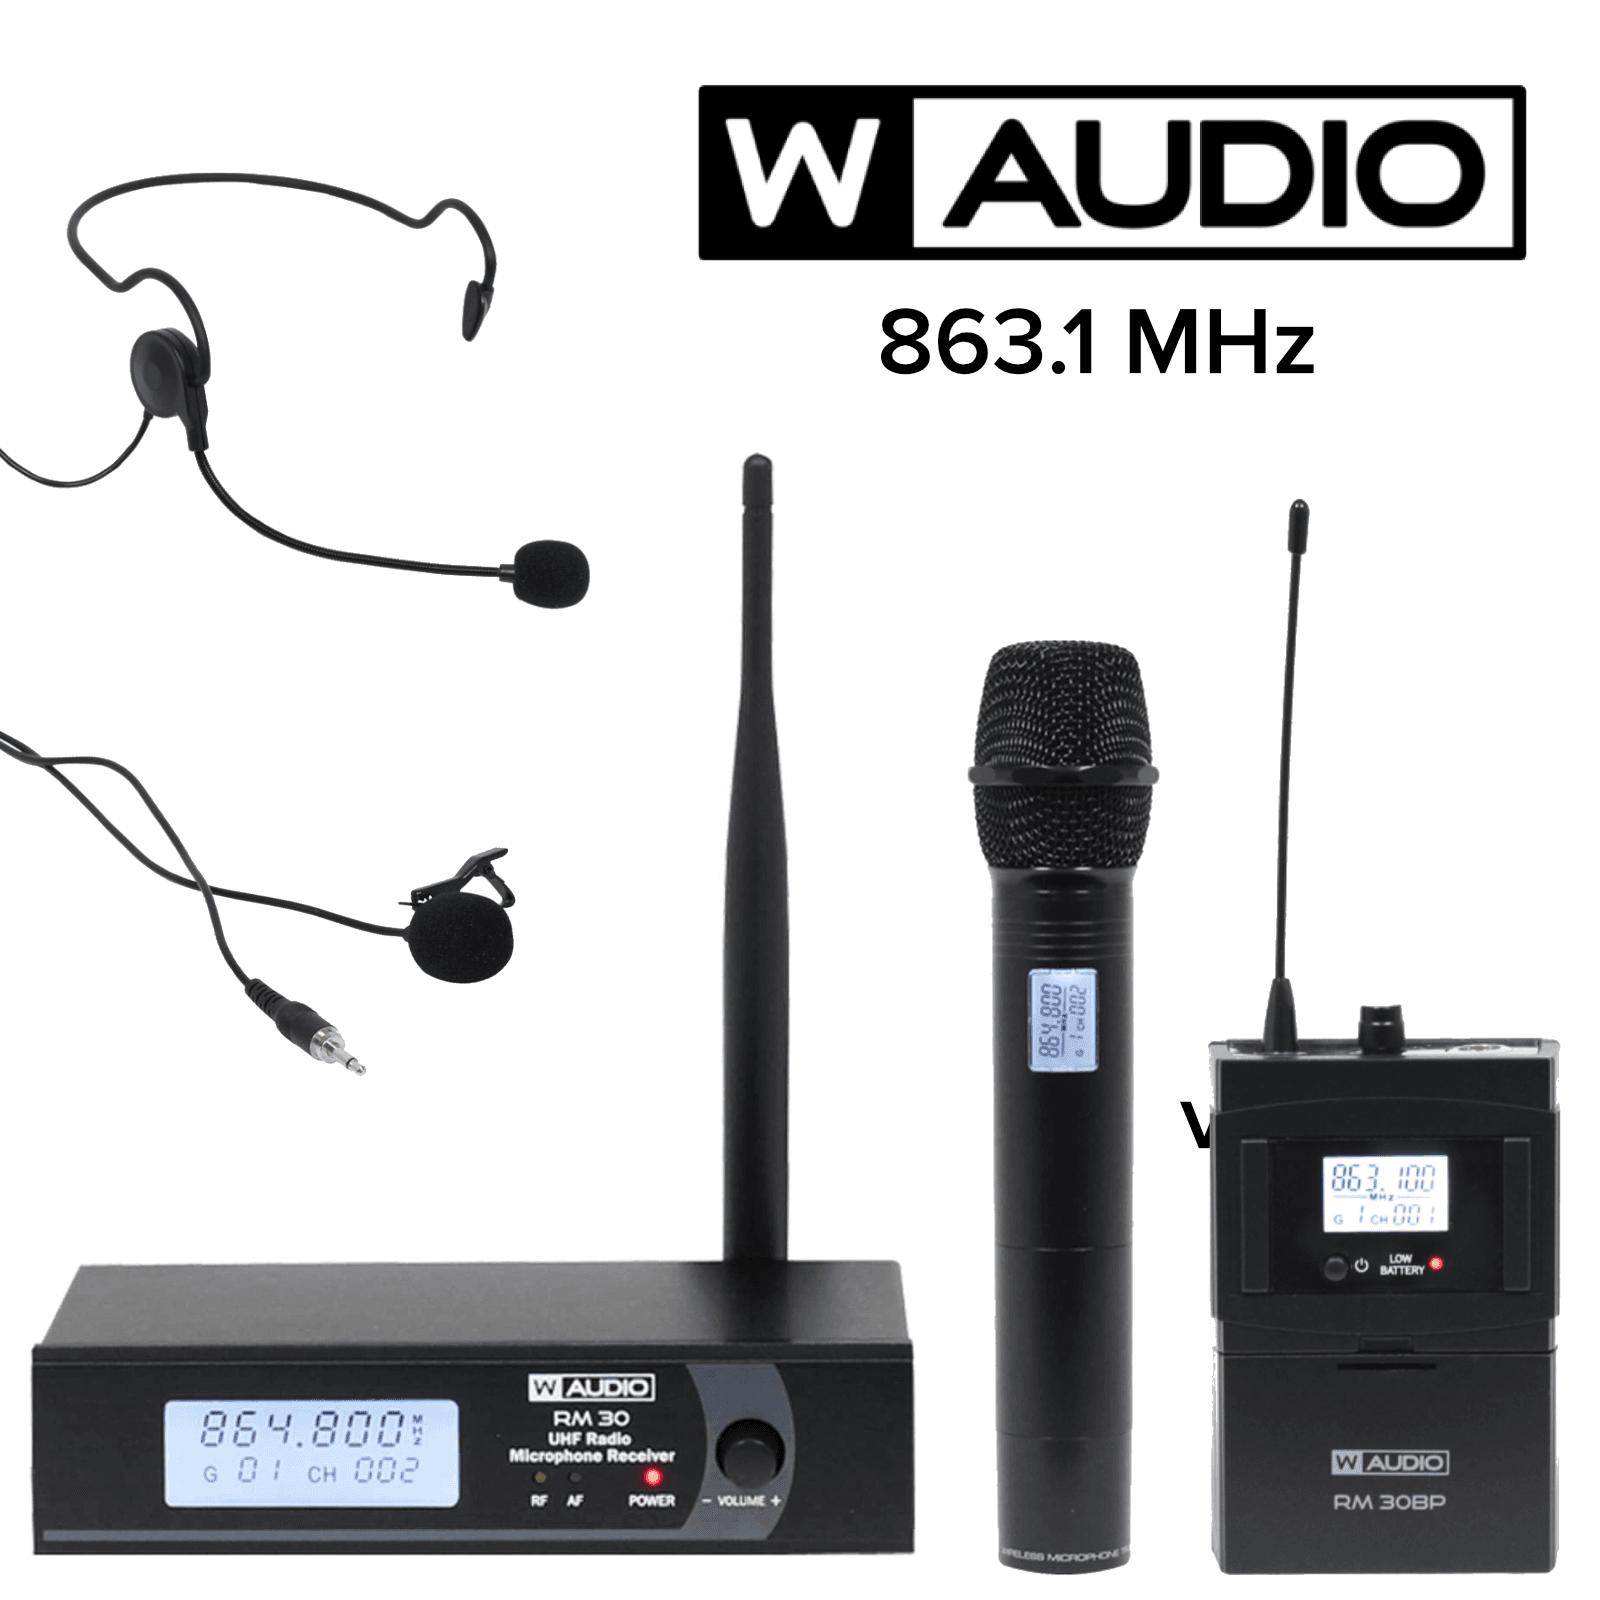 863.1Mhz//8 Prolight  W Audio   RM 30T Twin UHF Handheld Radio Microphone System